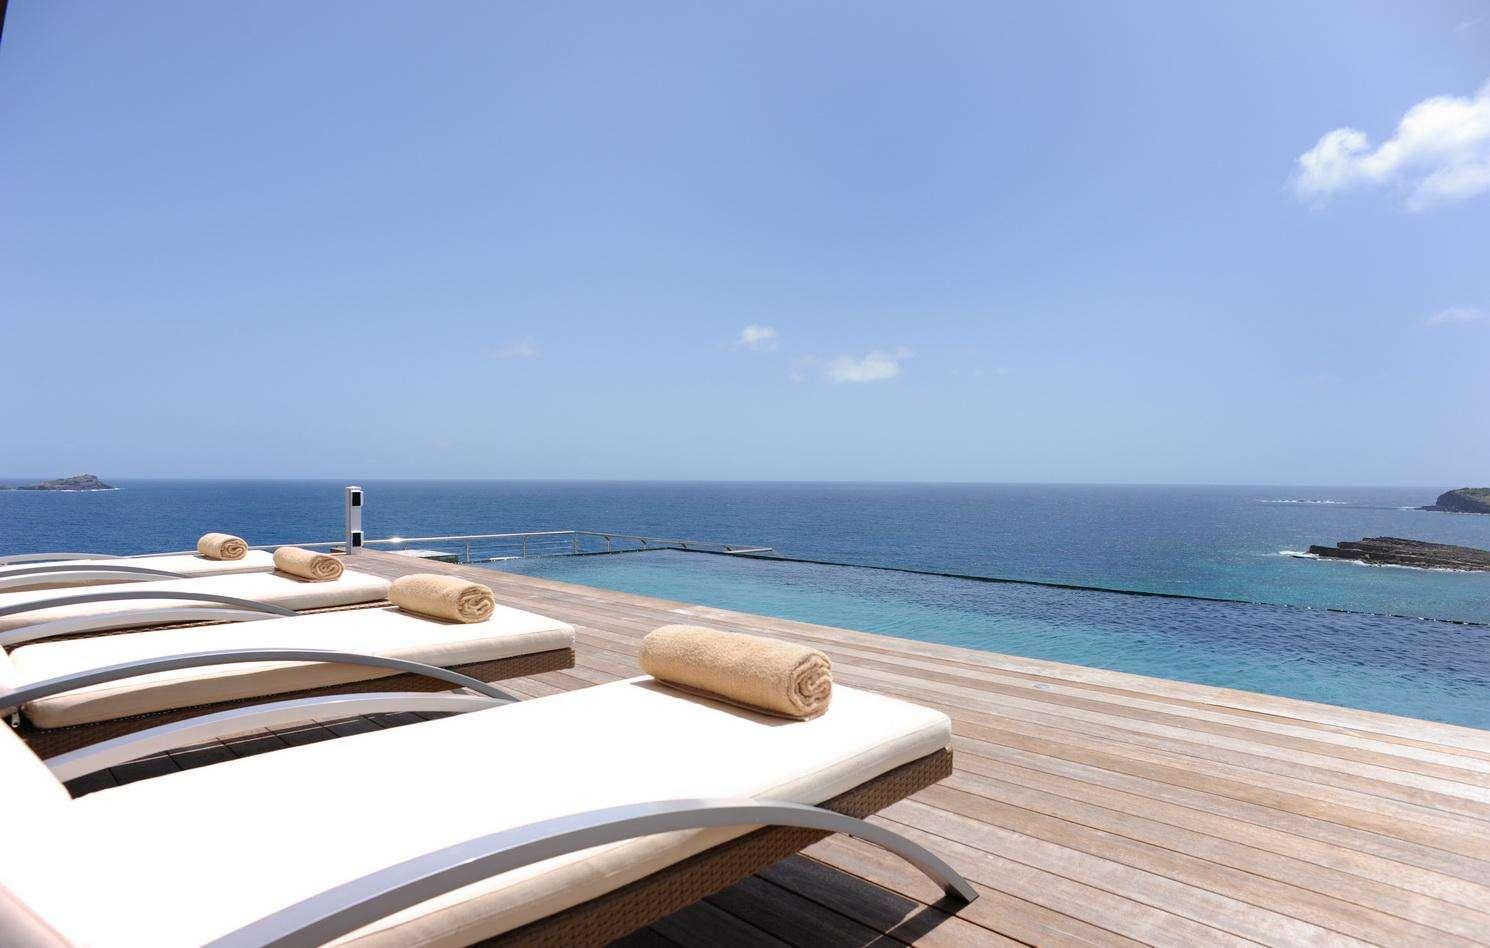 Luxury villa rentals caribbean - St barthelemy - Pointe milou - Seascape - Image 1/42